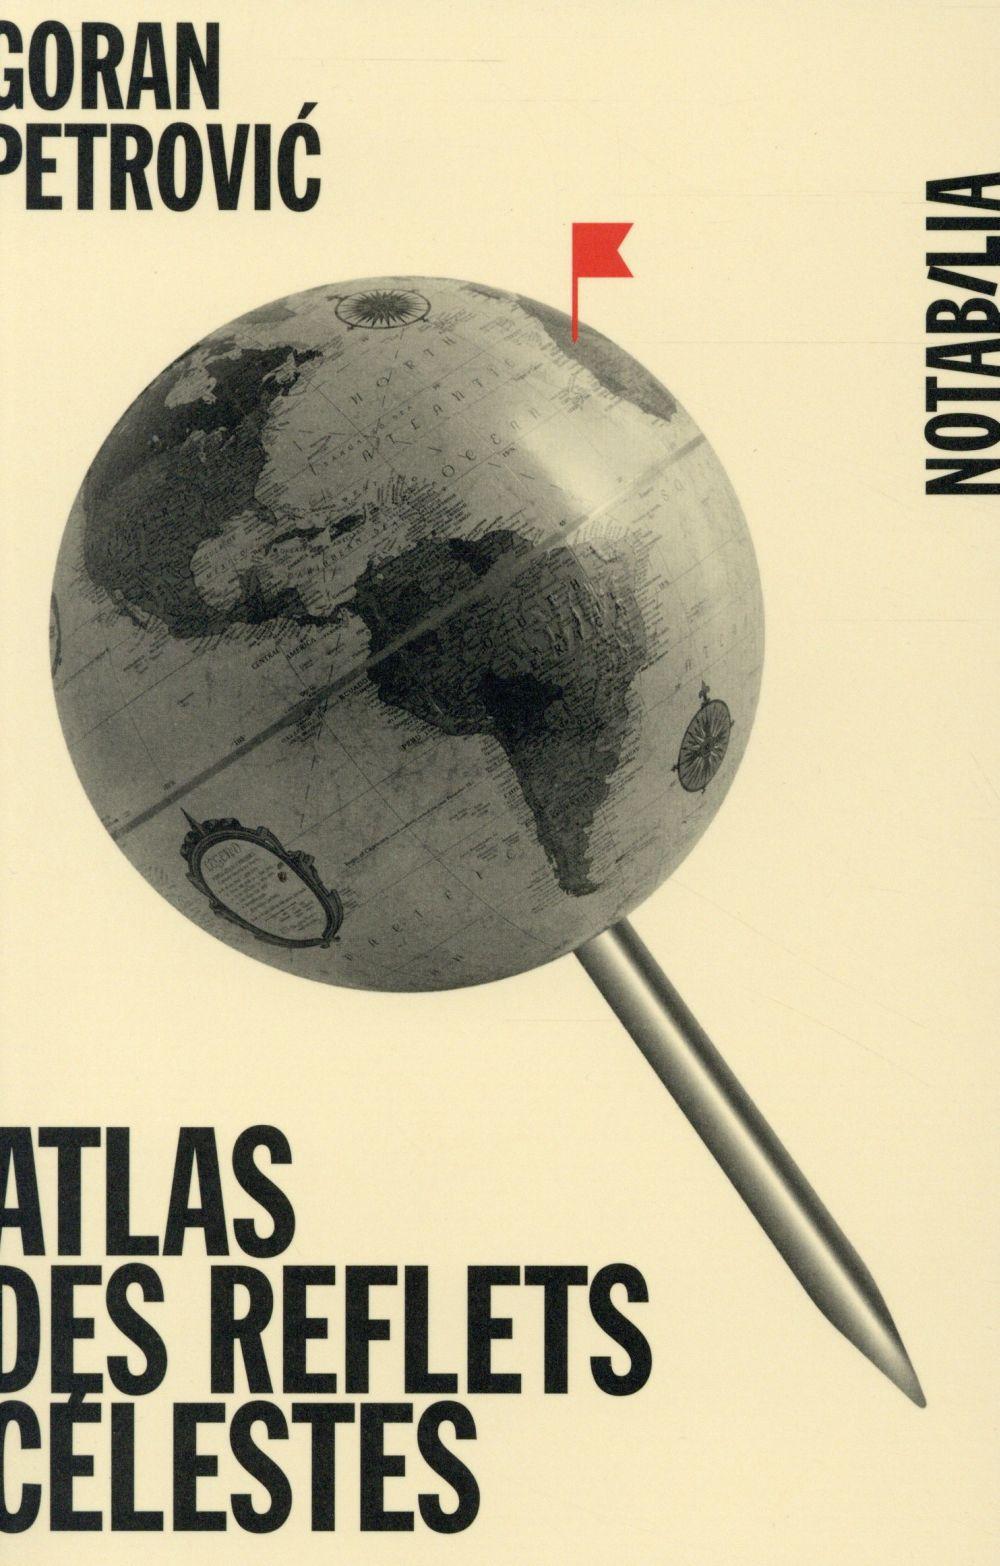 ATLAS DES REFLETS CELESTES